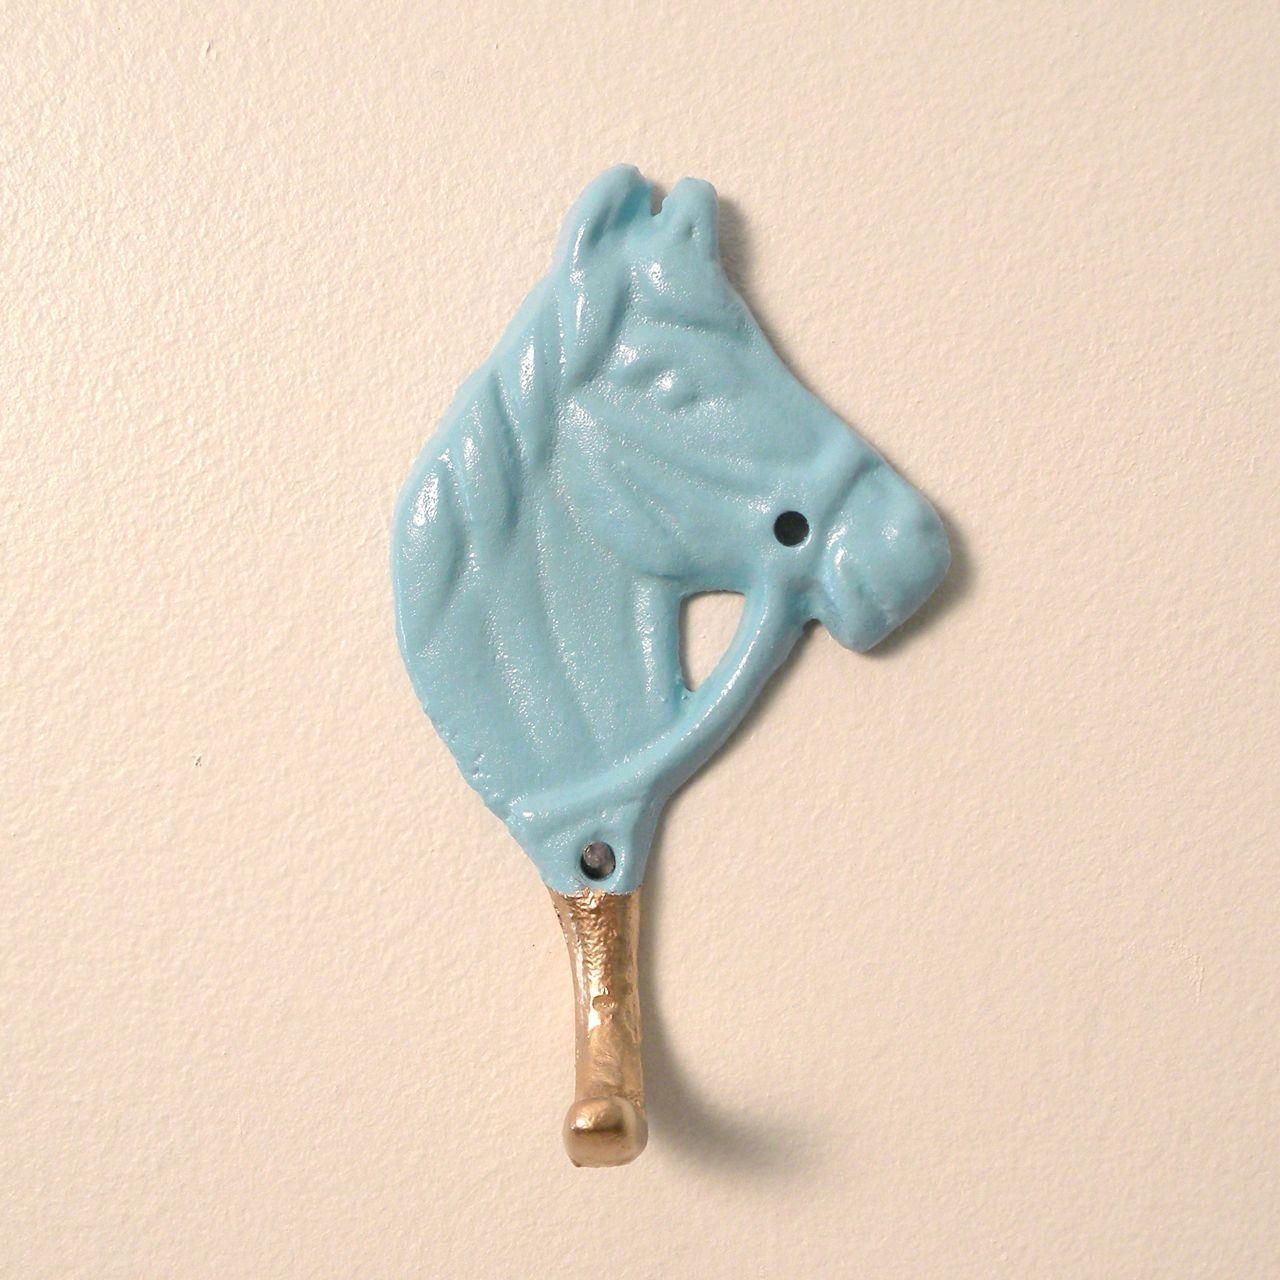 little cast iron horse hook. $10.00, via Etsy.